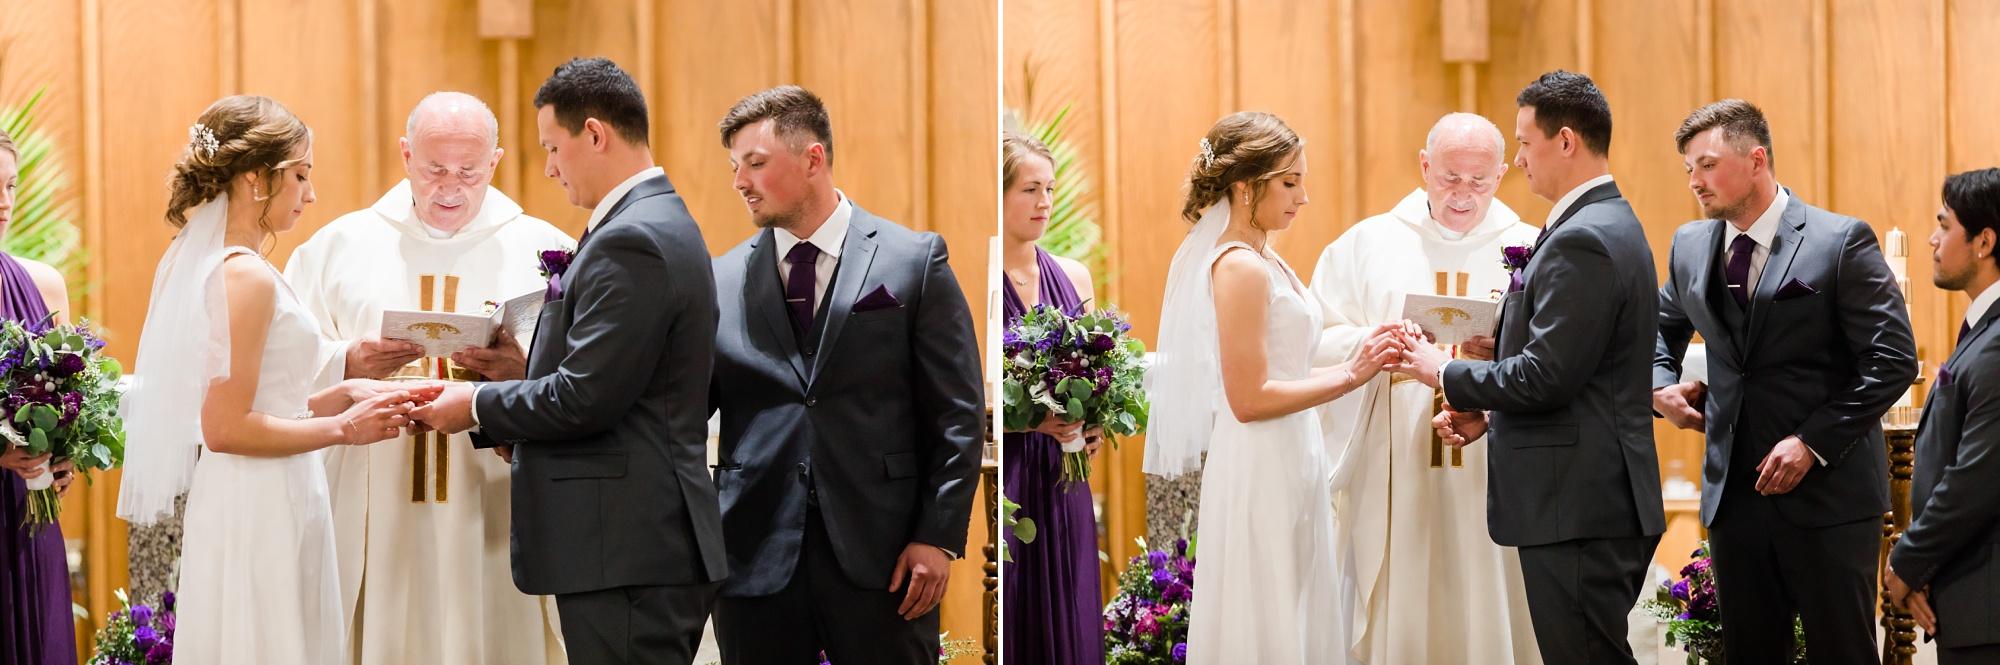 Amber Langerud Photography_Catholic Spring Wedding with Purple Accents_6337.jpg